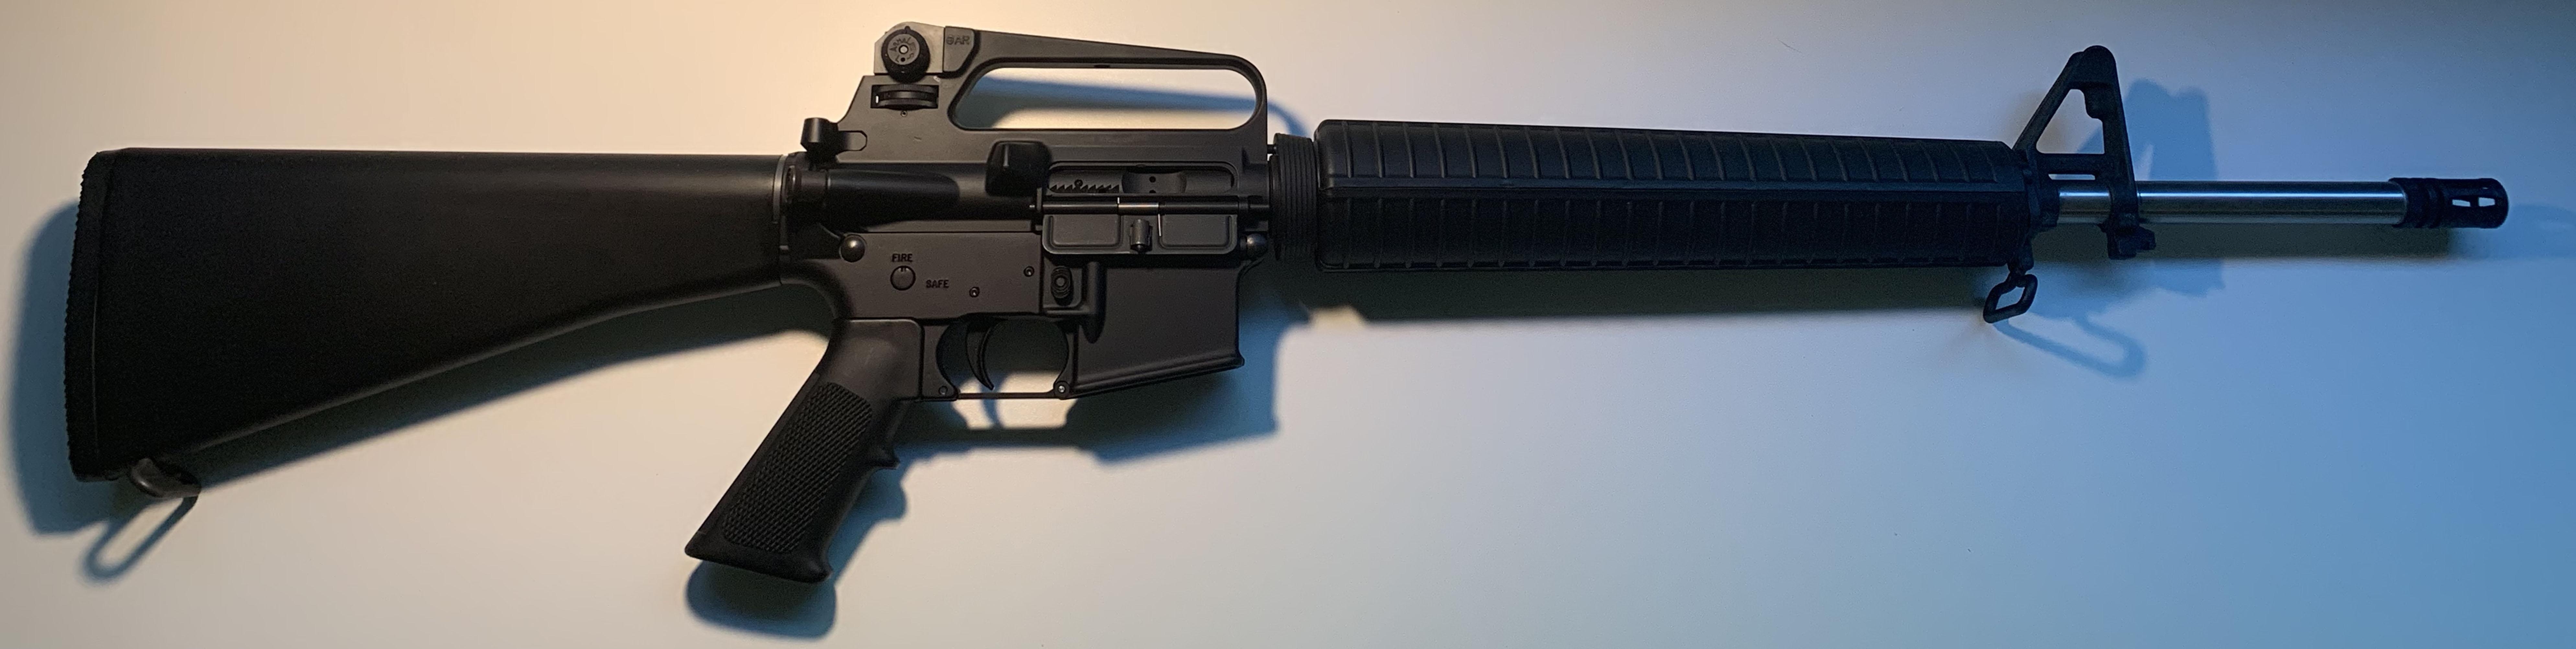 WTS: Bushmaster ACR/DMR-armalite-nm15.jpg